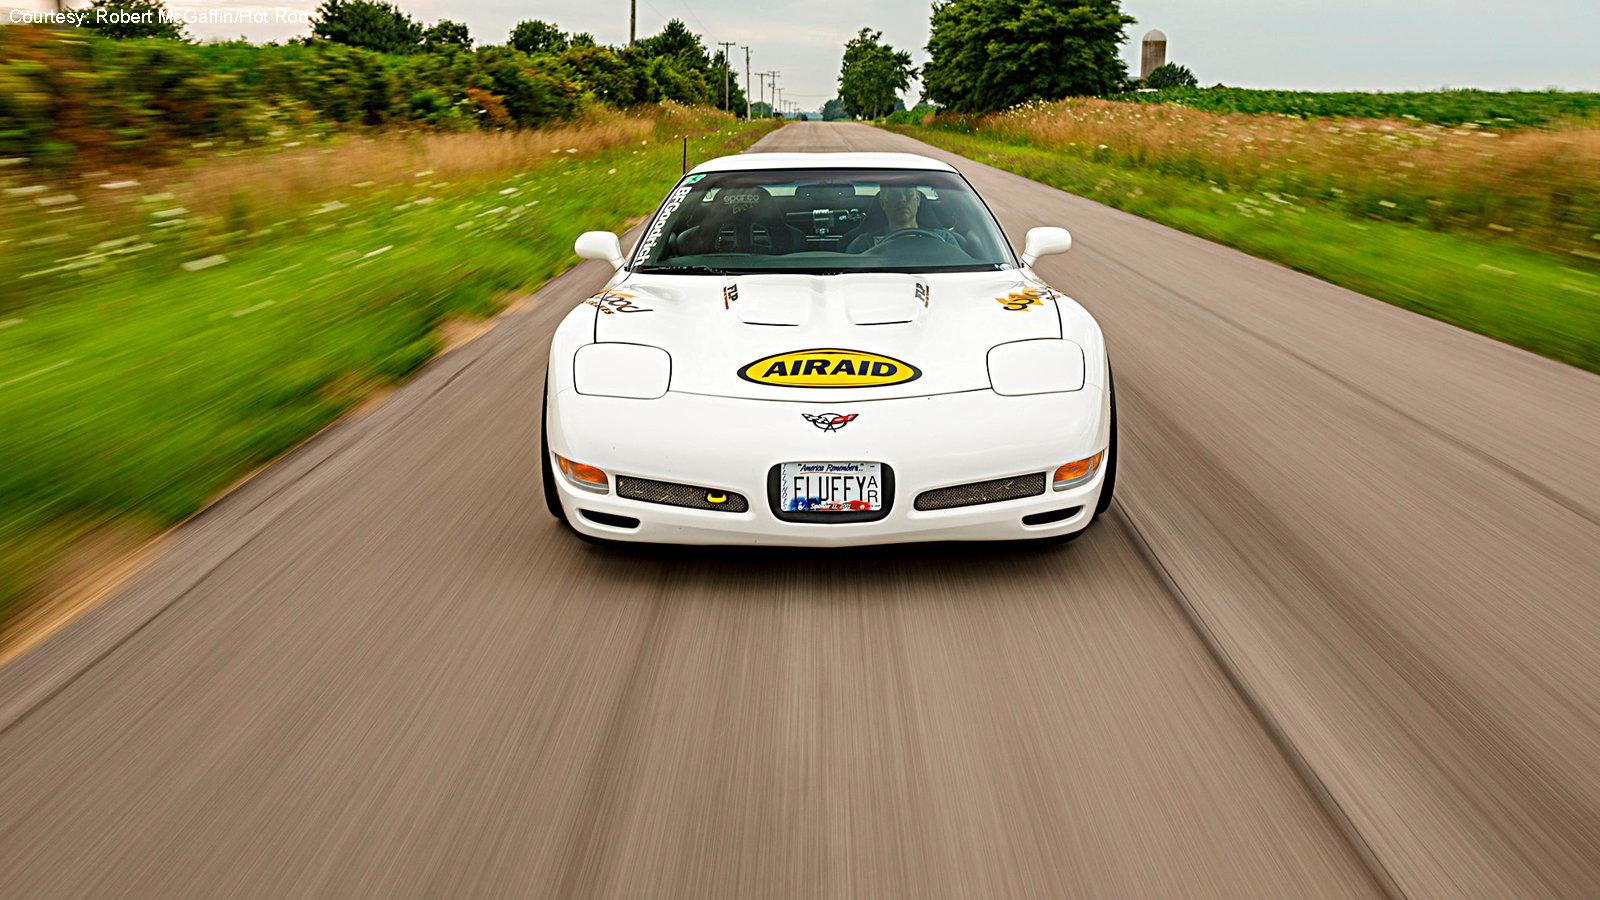 Man Buys Katech C5 Corvette, Goes Racing